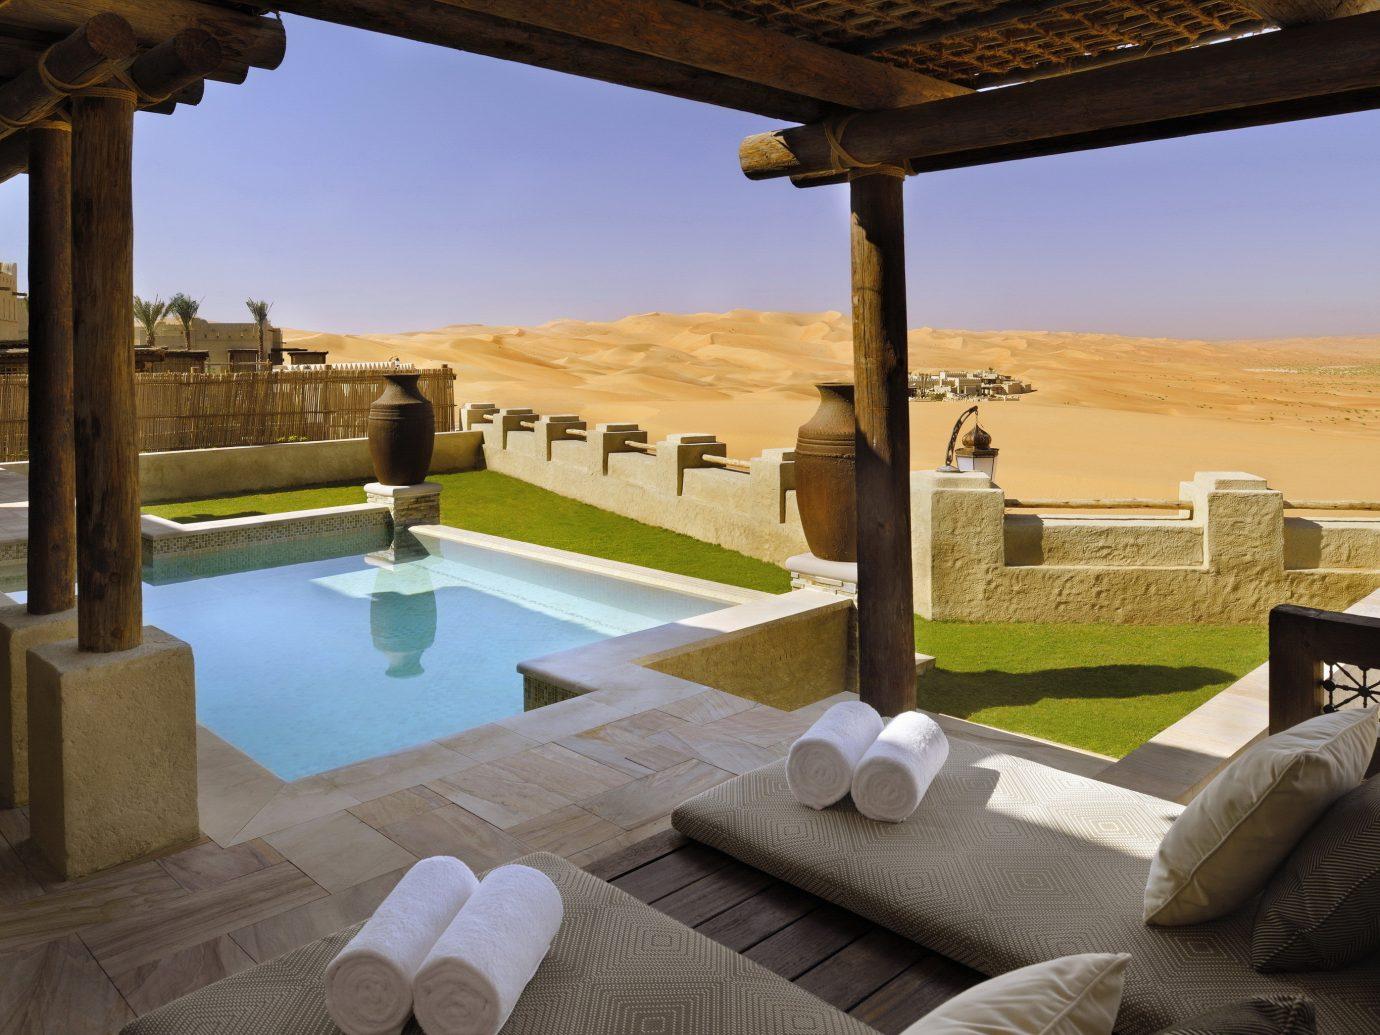 Trip Ideas grass building property estate vacation home Villa swimming pool Resort hacienda mansion overlooking